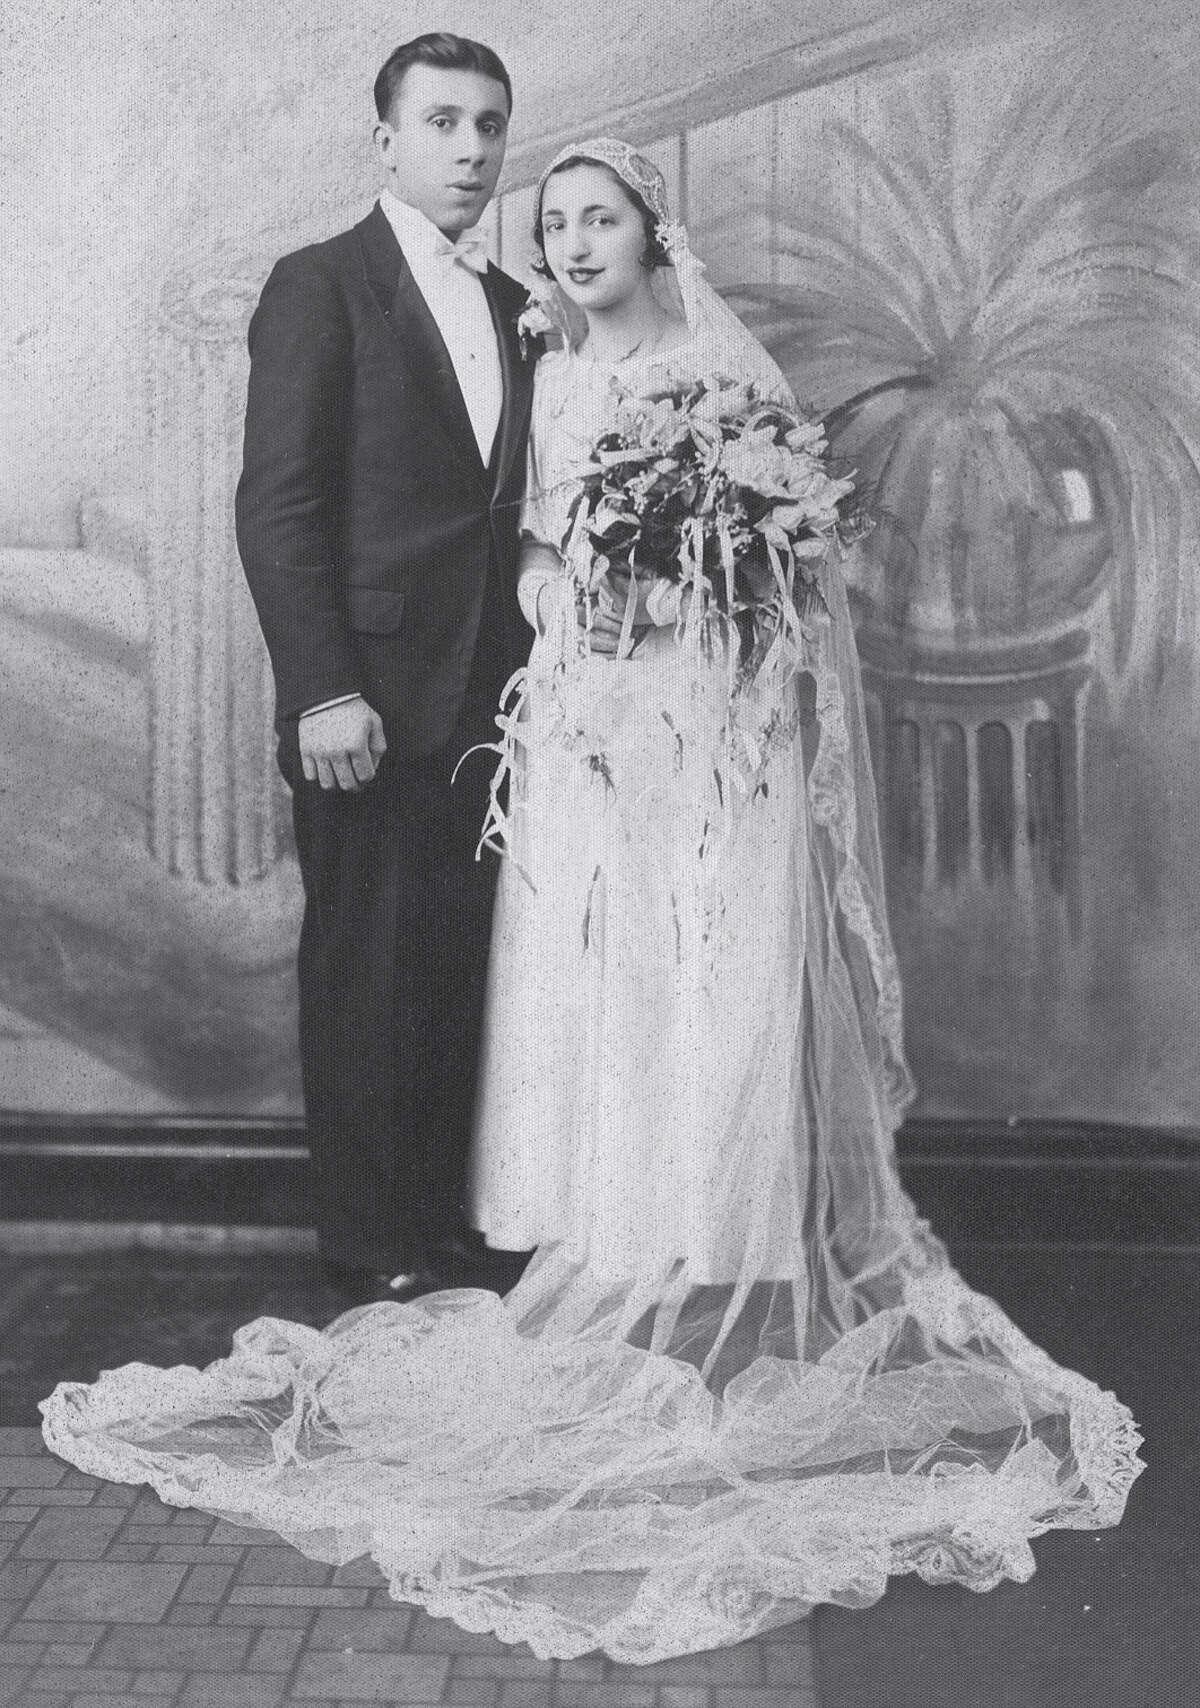 A wedding portrait of Fairfielders John and Ann Betar taken 80 years ago. Fairfield CT 11/15/12